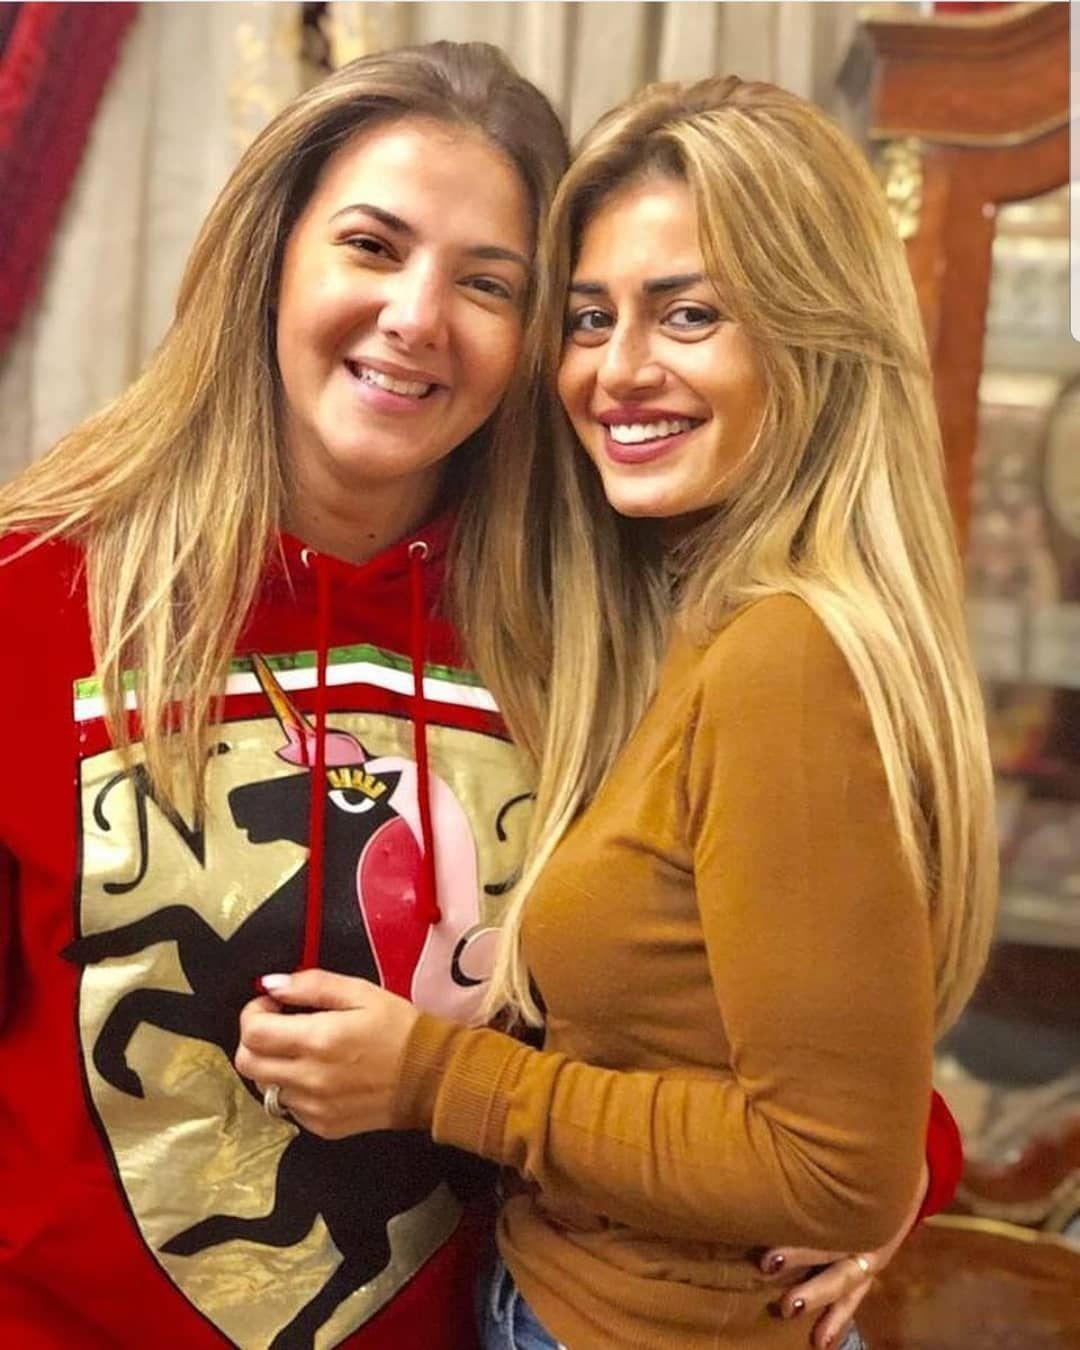 Egypt Celebrity On Instagram منة فضالي Menna Fadali Official Menna Fadali Official Donia Samir Ghanne Egyptian Actress Arab Fashion Celebrities